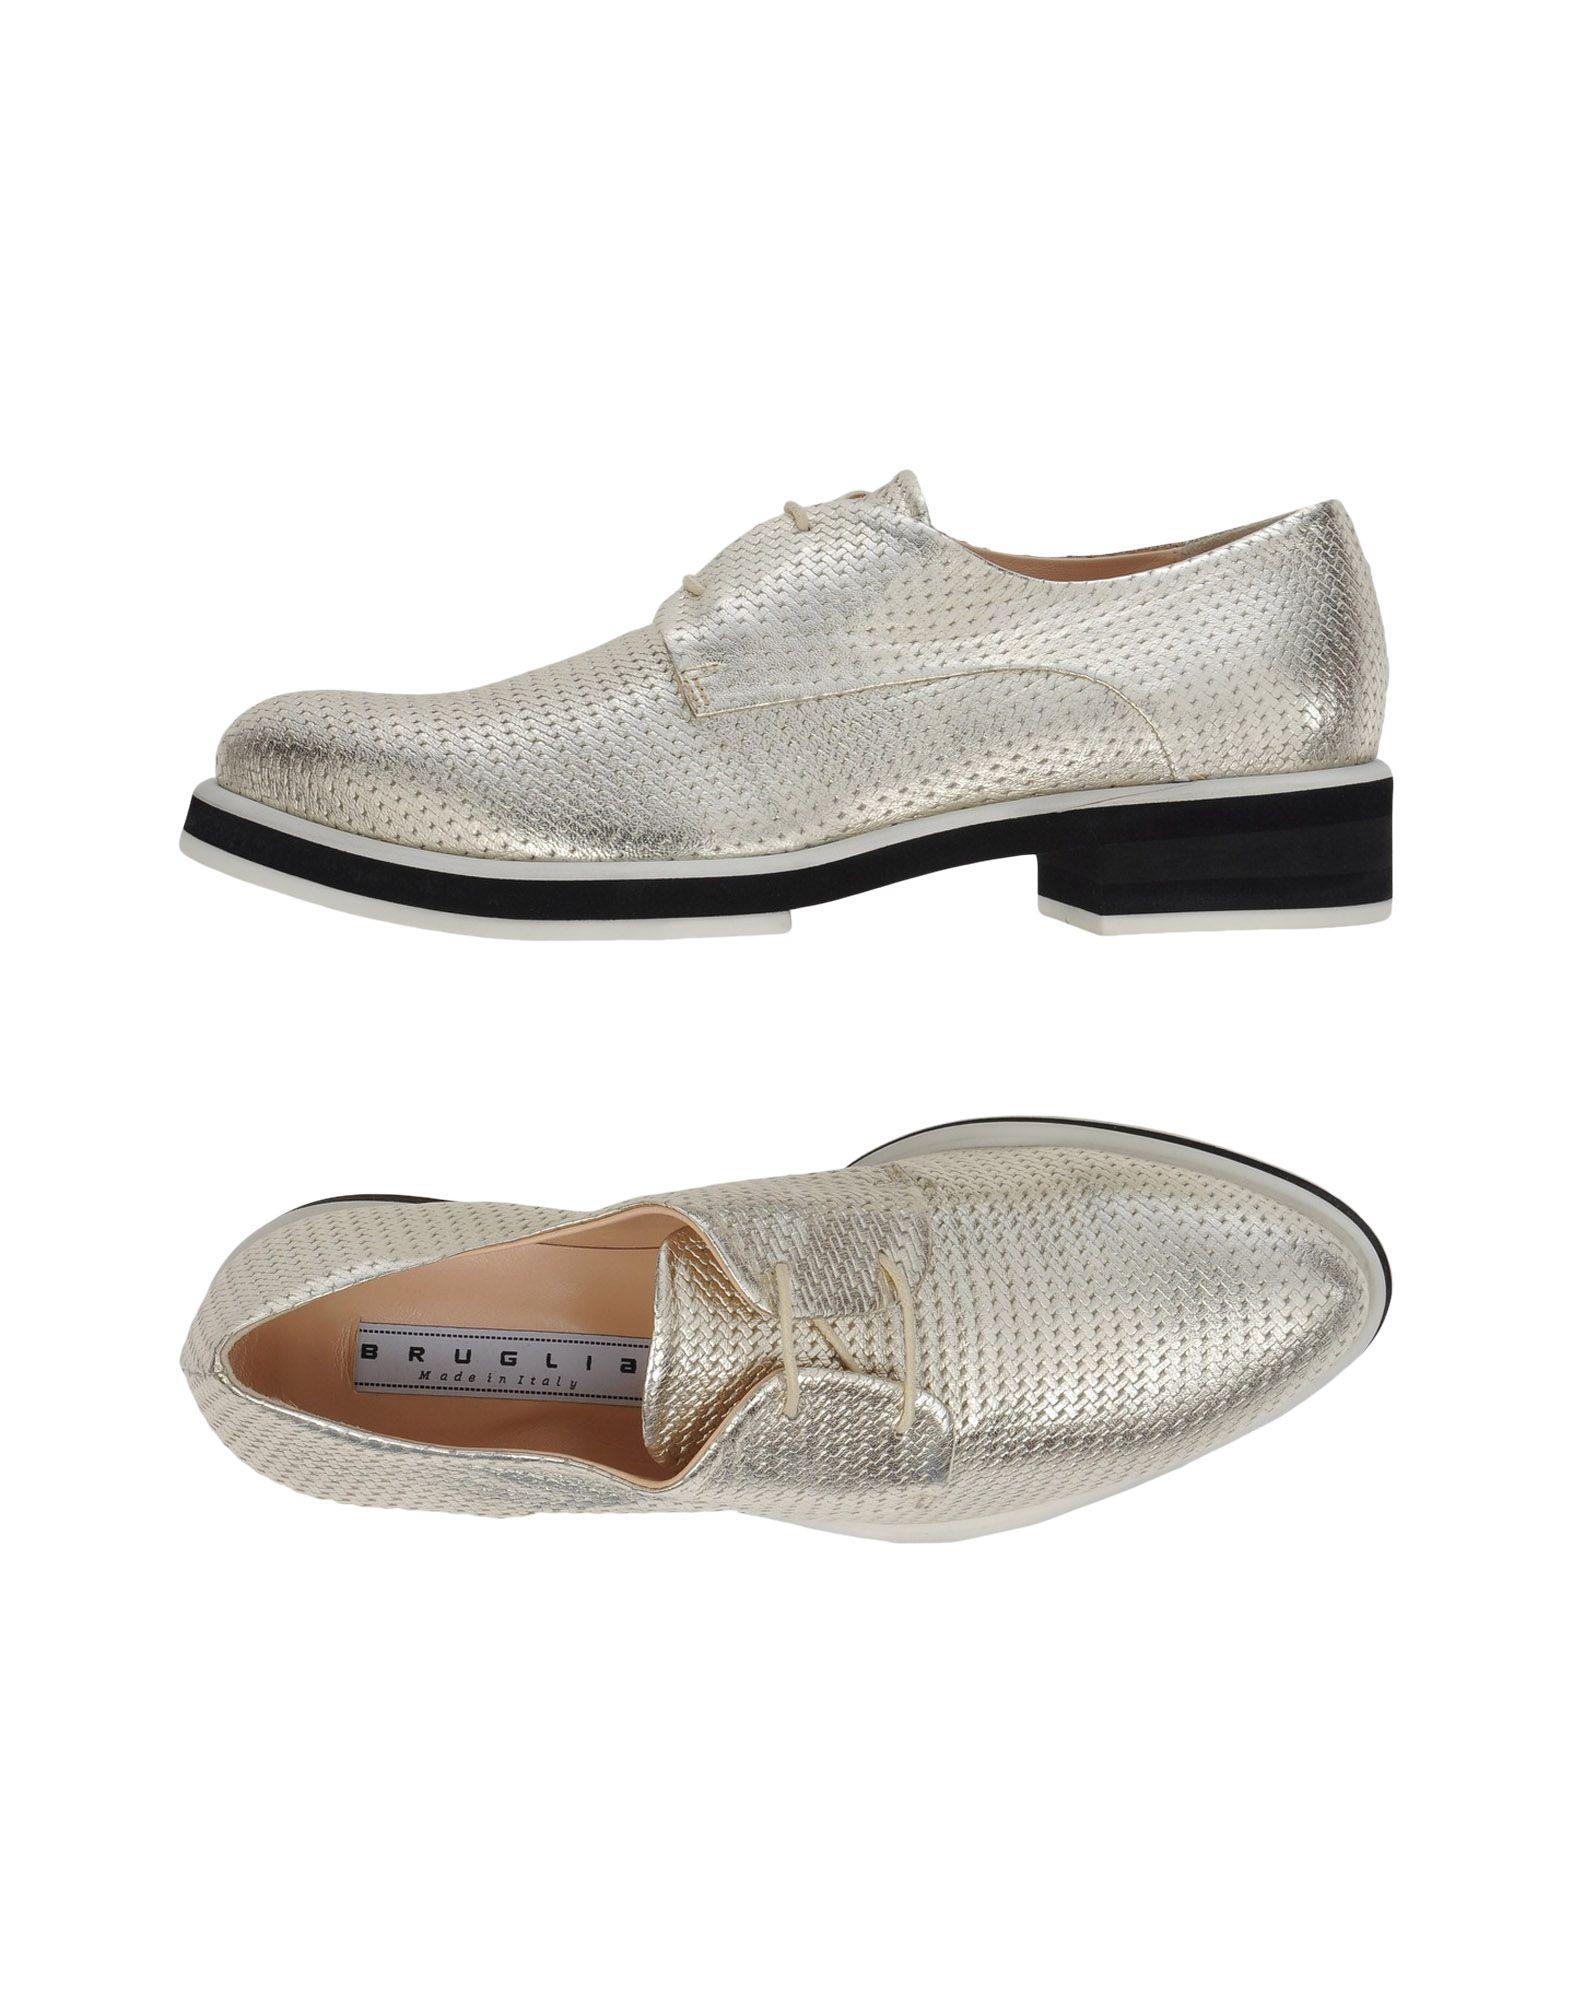 F.Lli Bruglia Schnürschuhe Damen  11346158XW Gute Qualität beliebte Schuhe